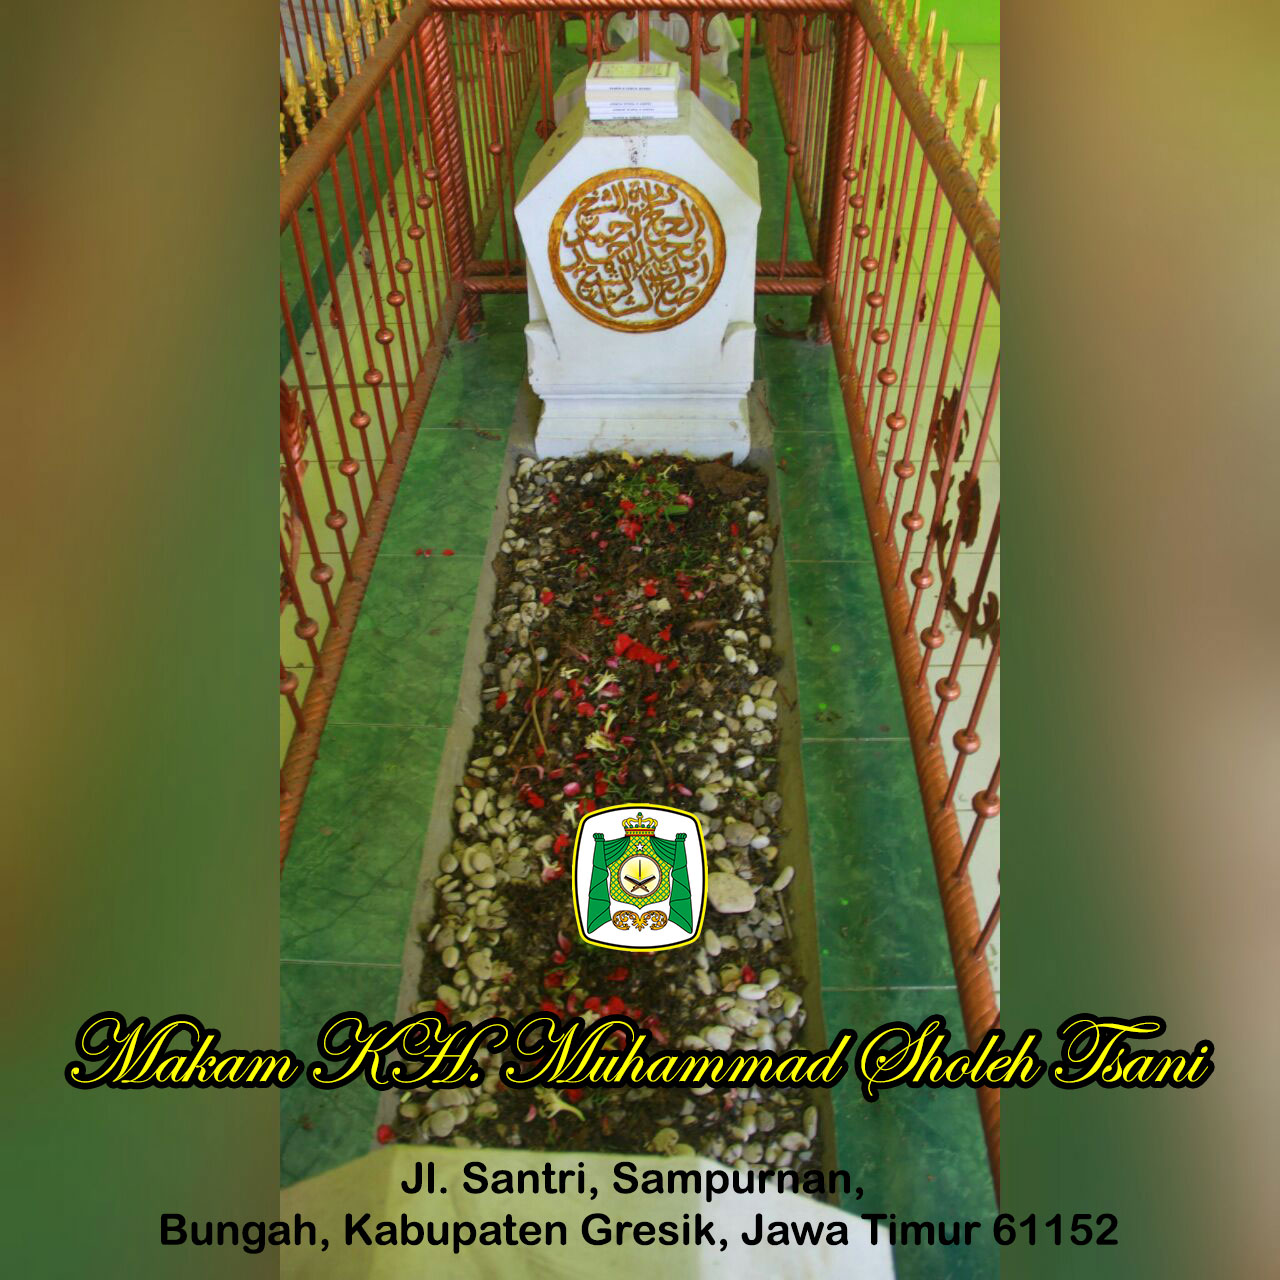 Kh Muhammad Sholeh Tsani Almunawwarah Trans Situs Giri Kedaton Makam